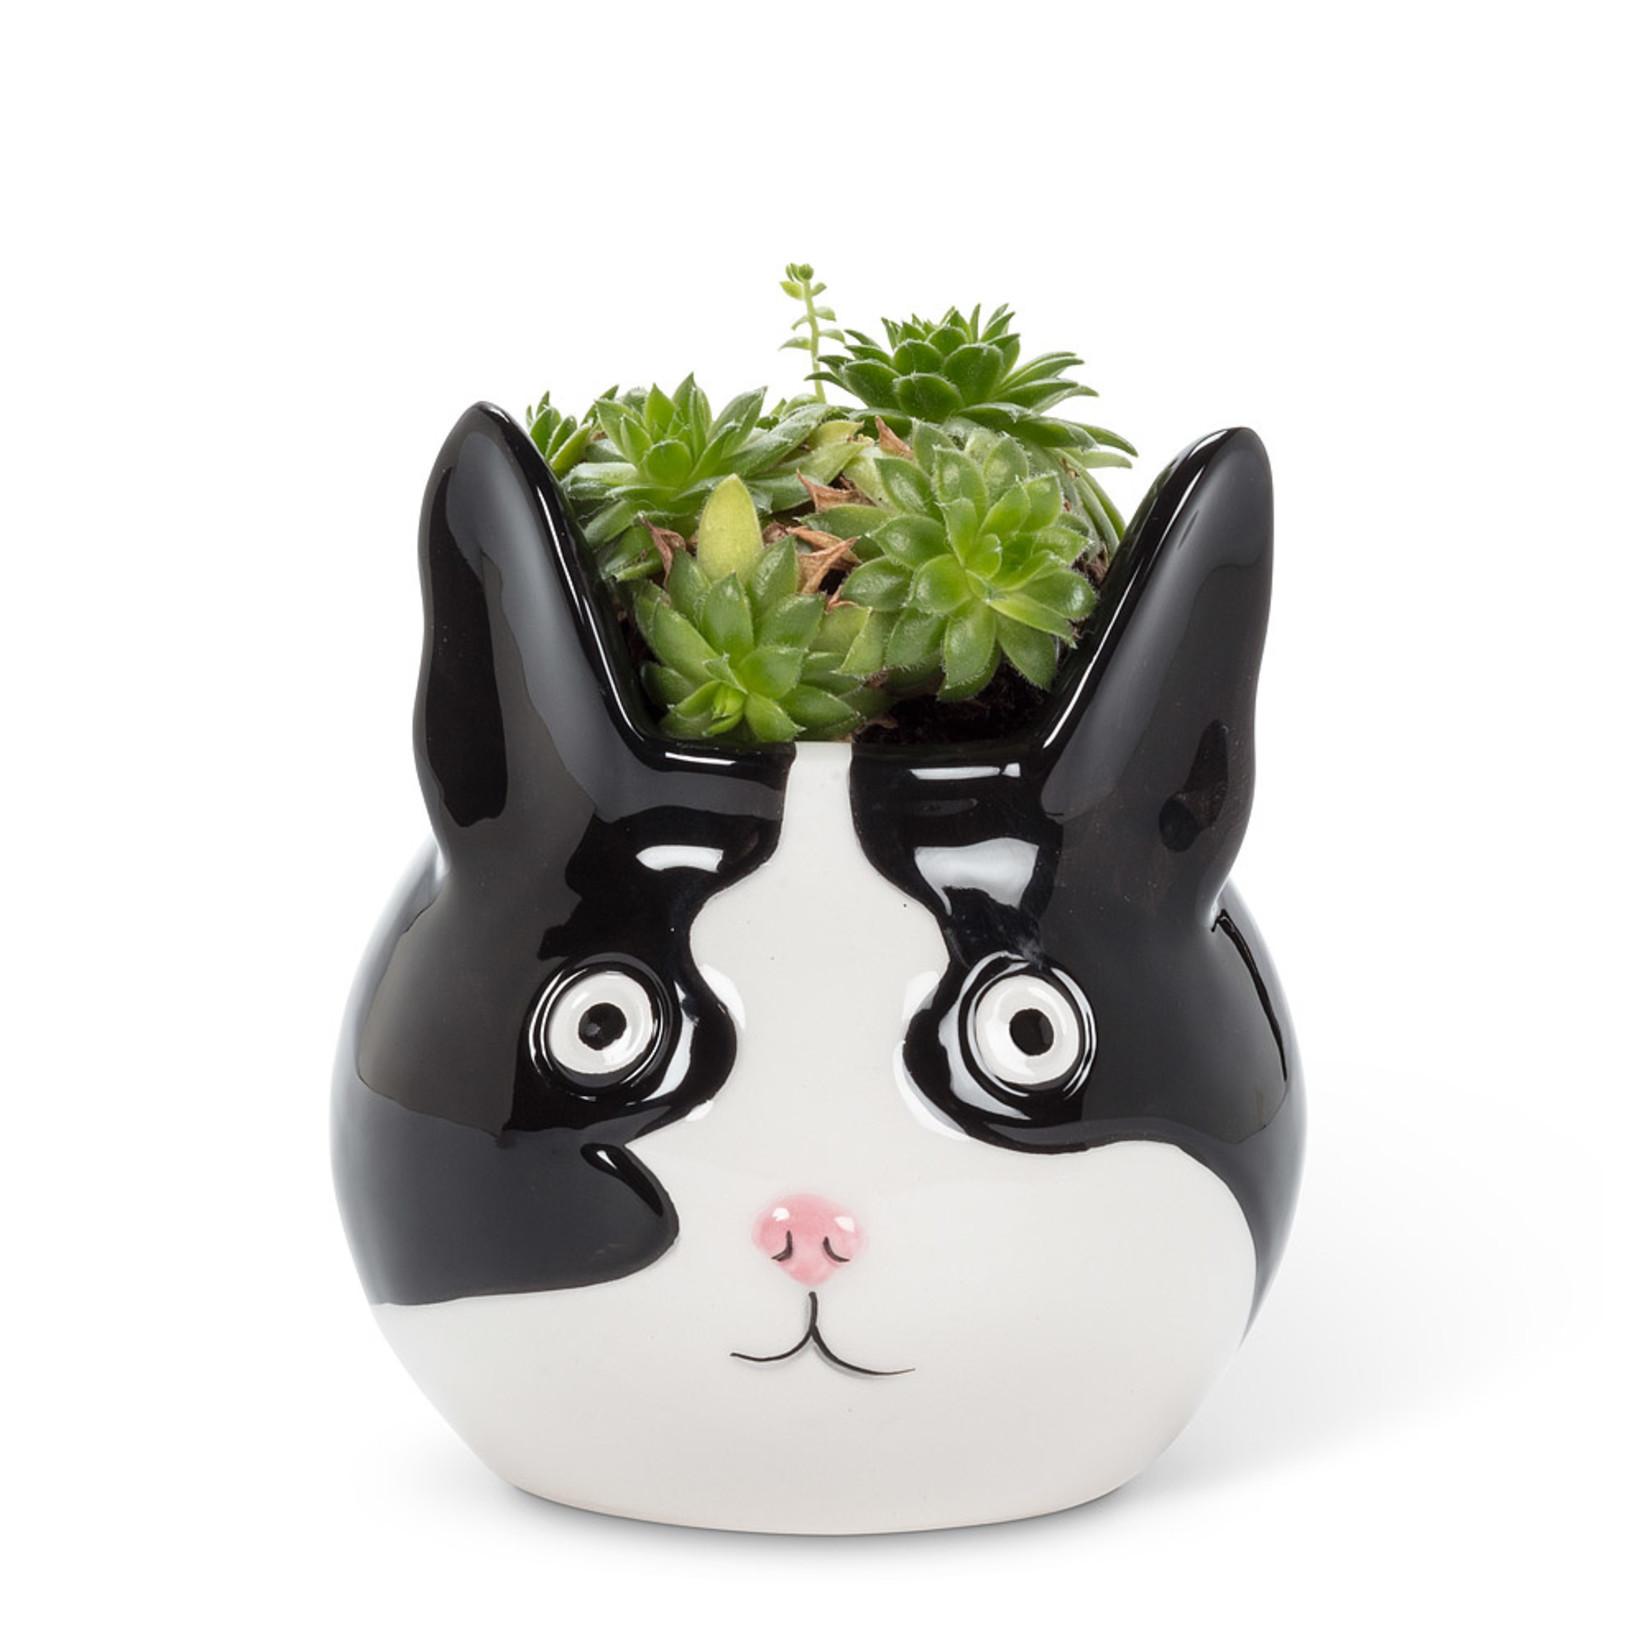 Abbott Cat Planter